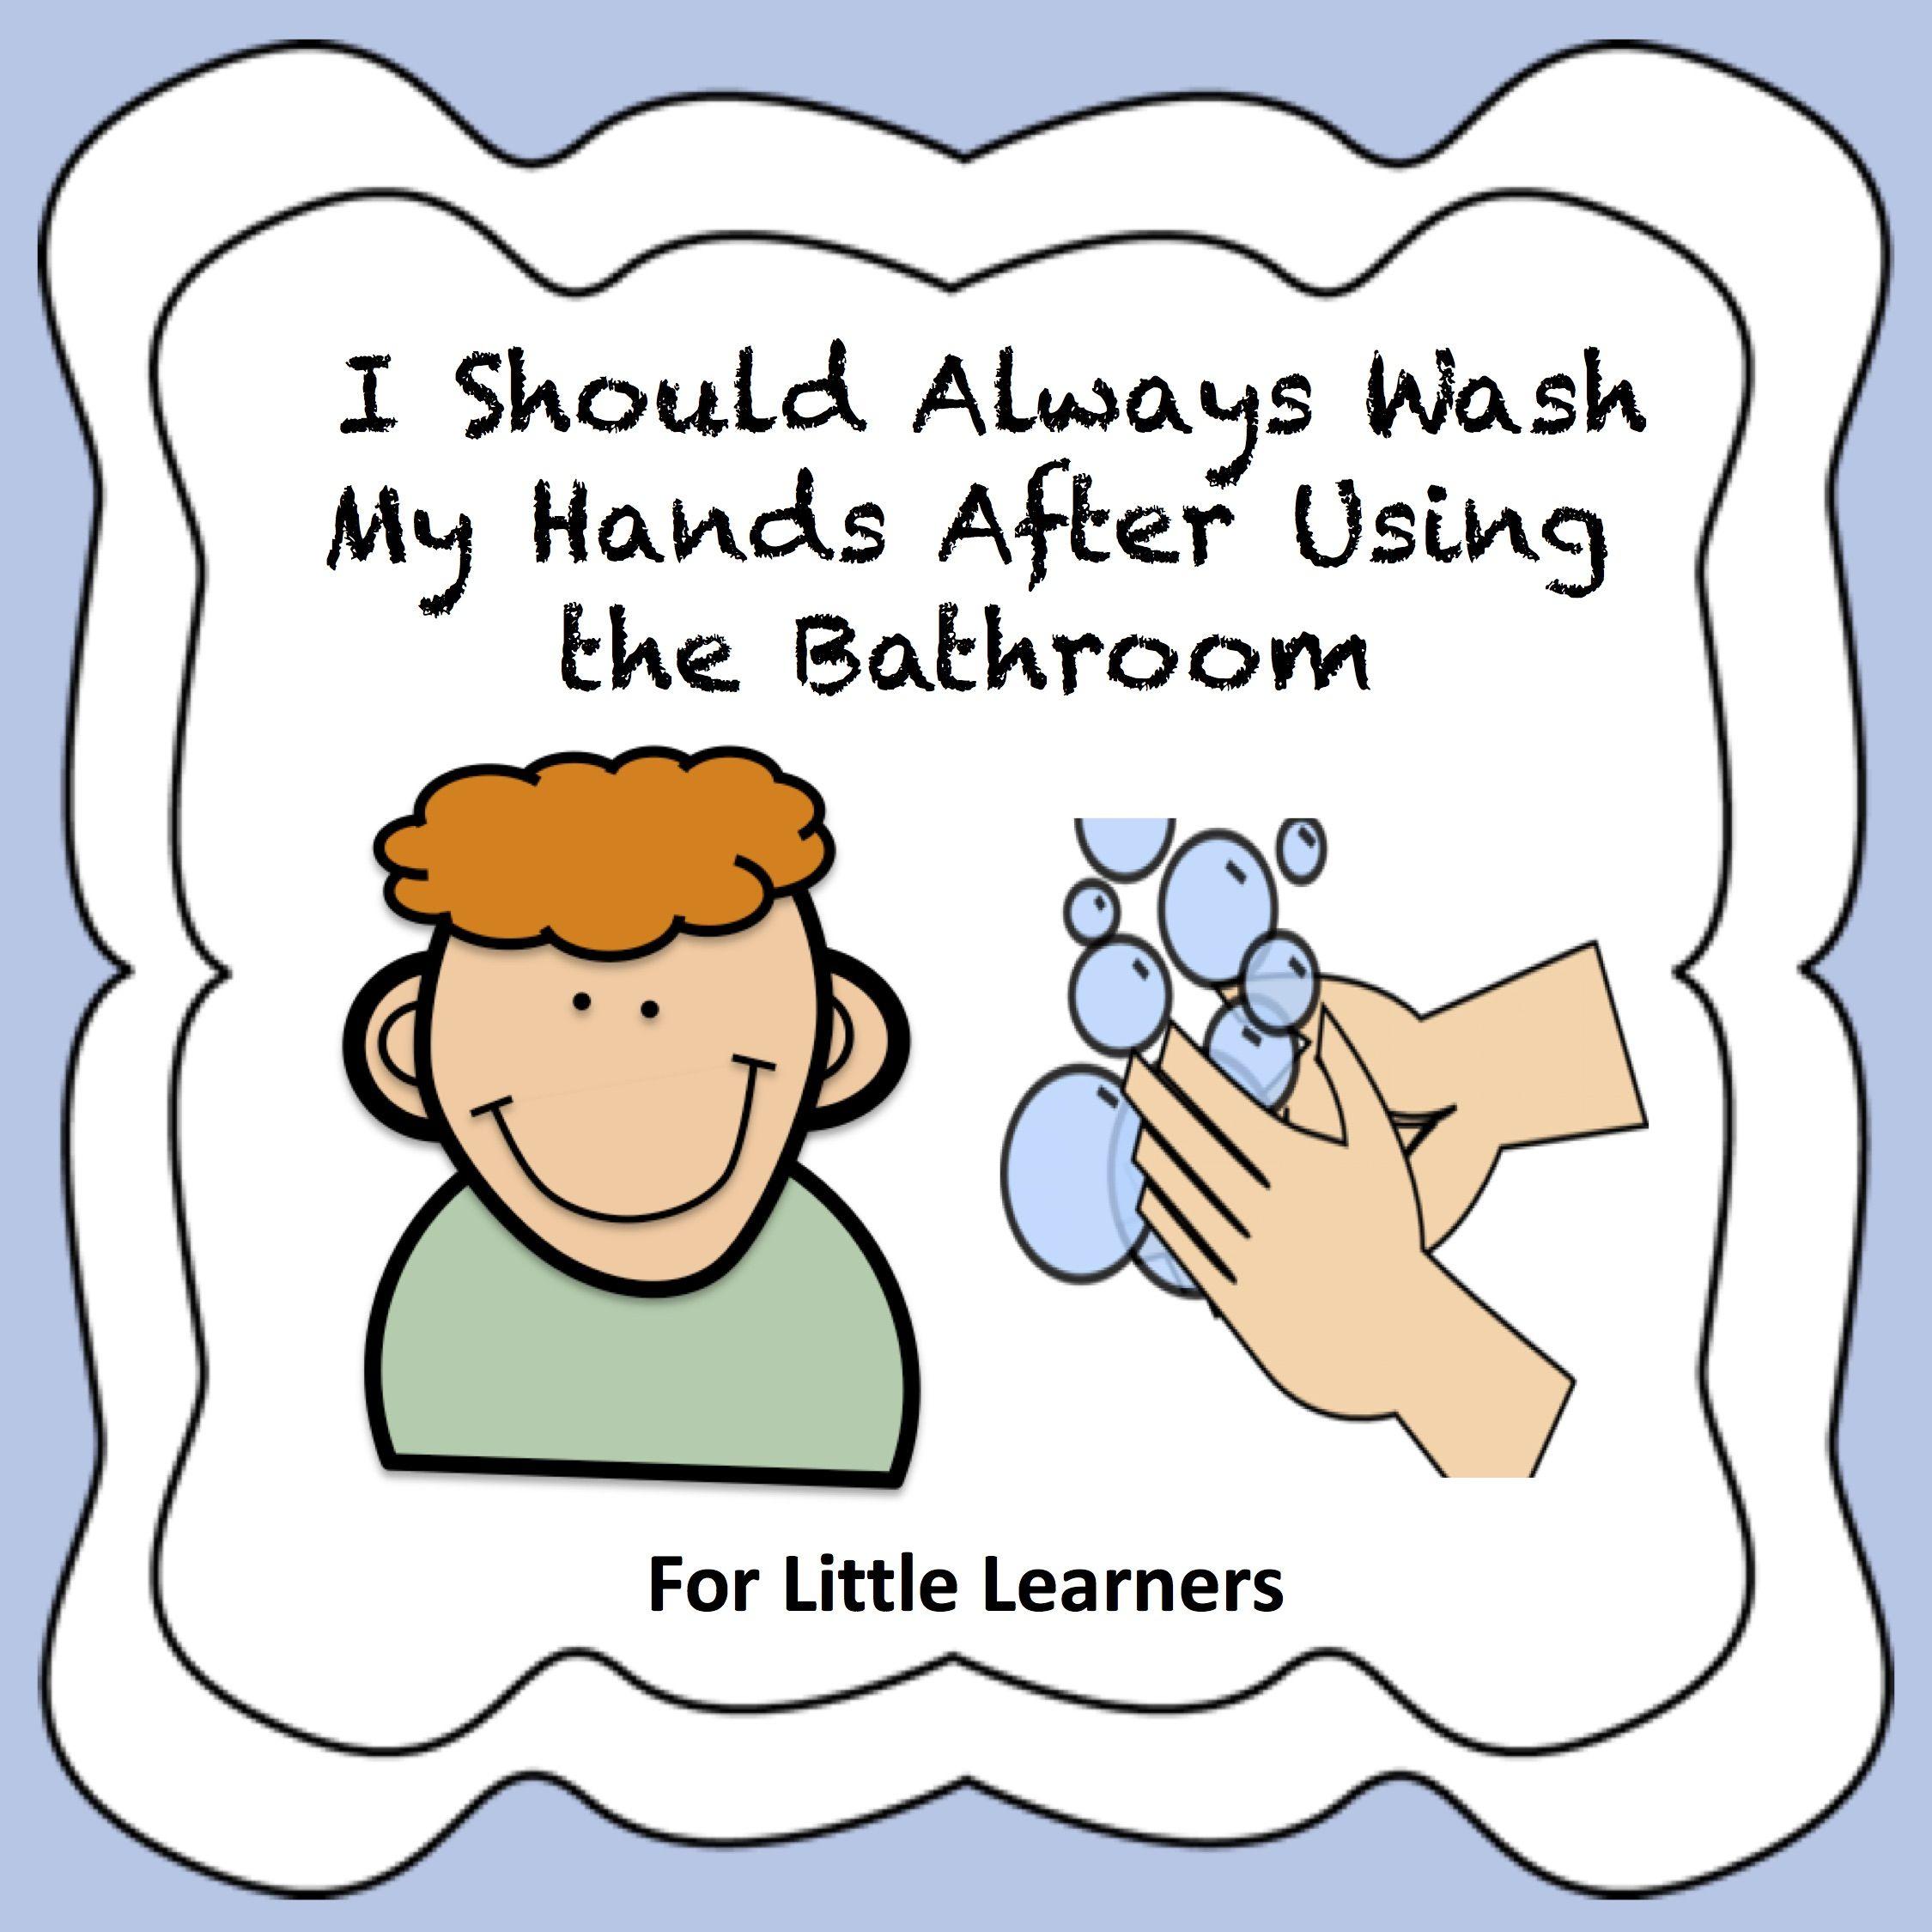 I Should Always Wash My Hands